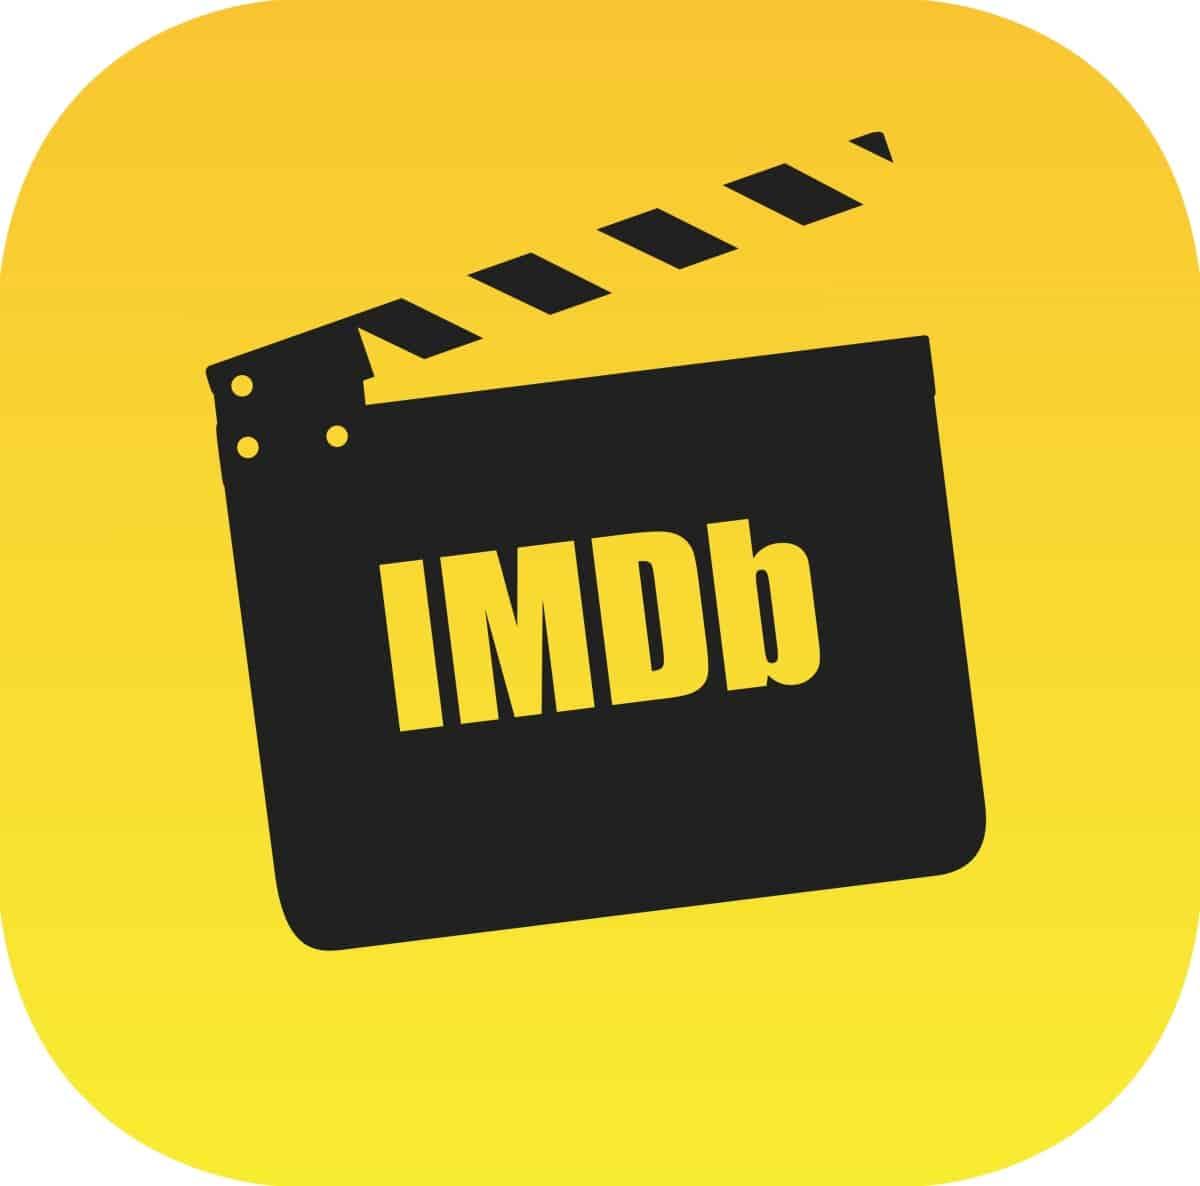 IMDb - Internet Movie Database